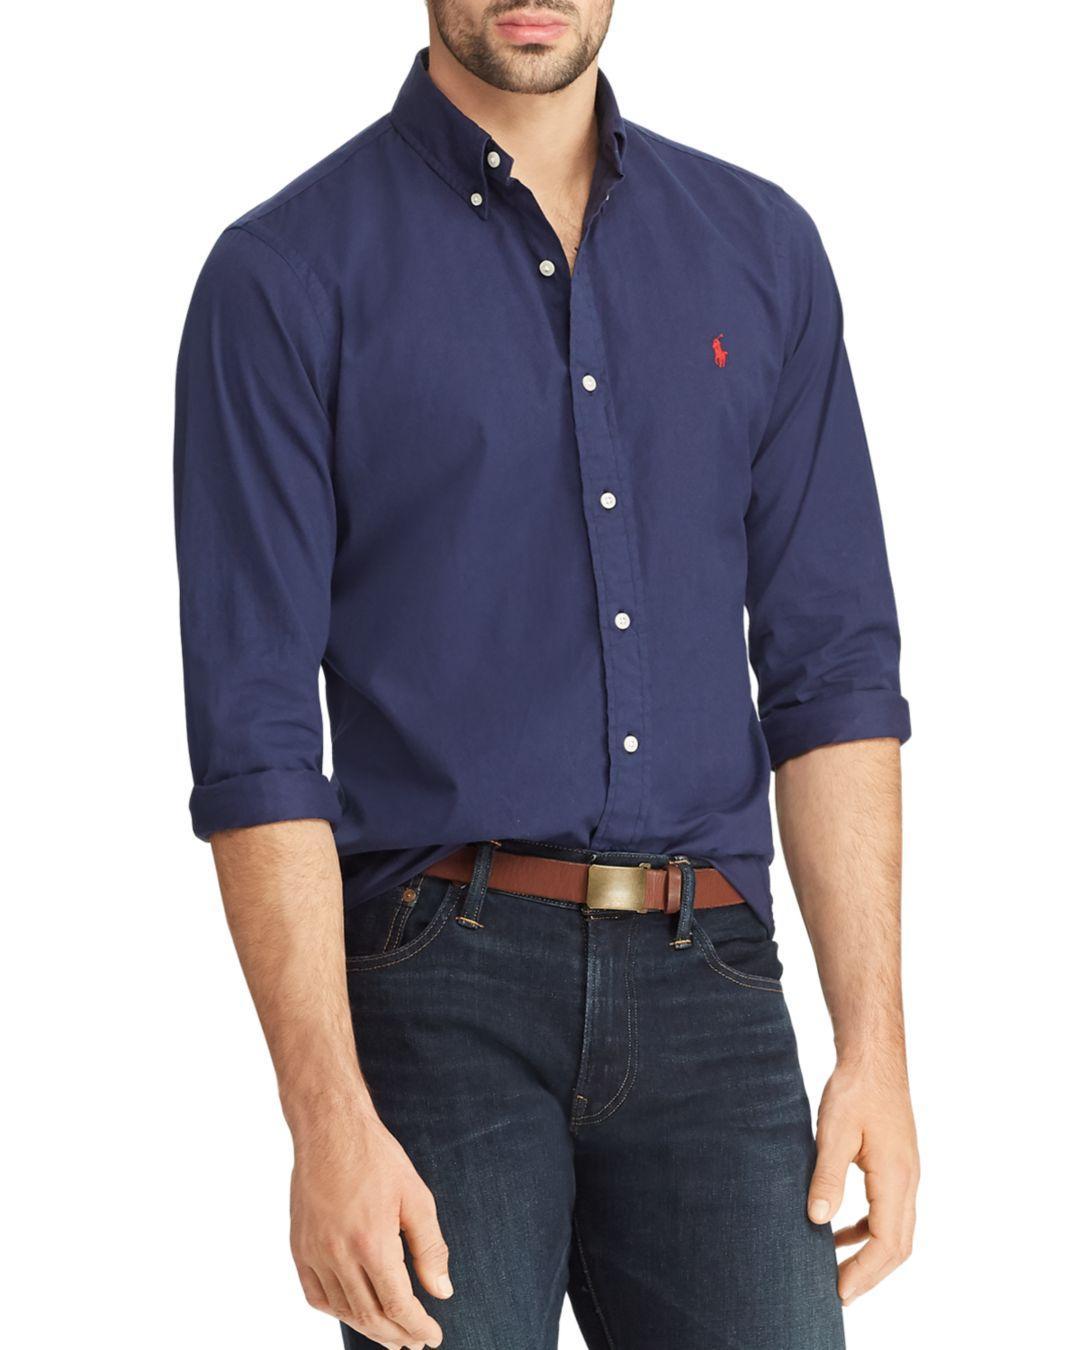 f2884b45f00 Lyst - Polo Ralph Lauren Slim Fit Button-down Twill Shirt in Blue ...